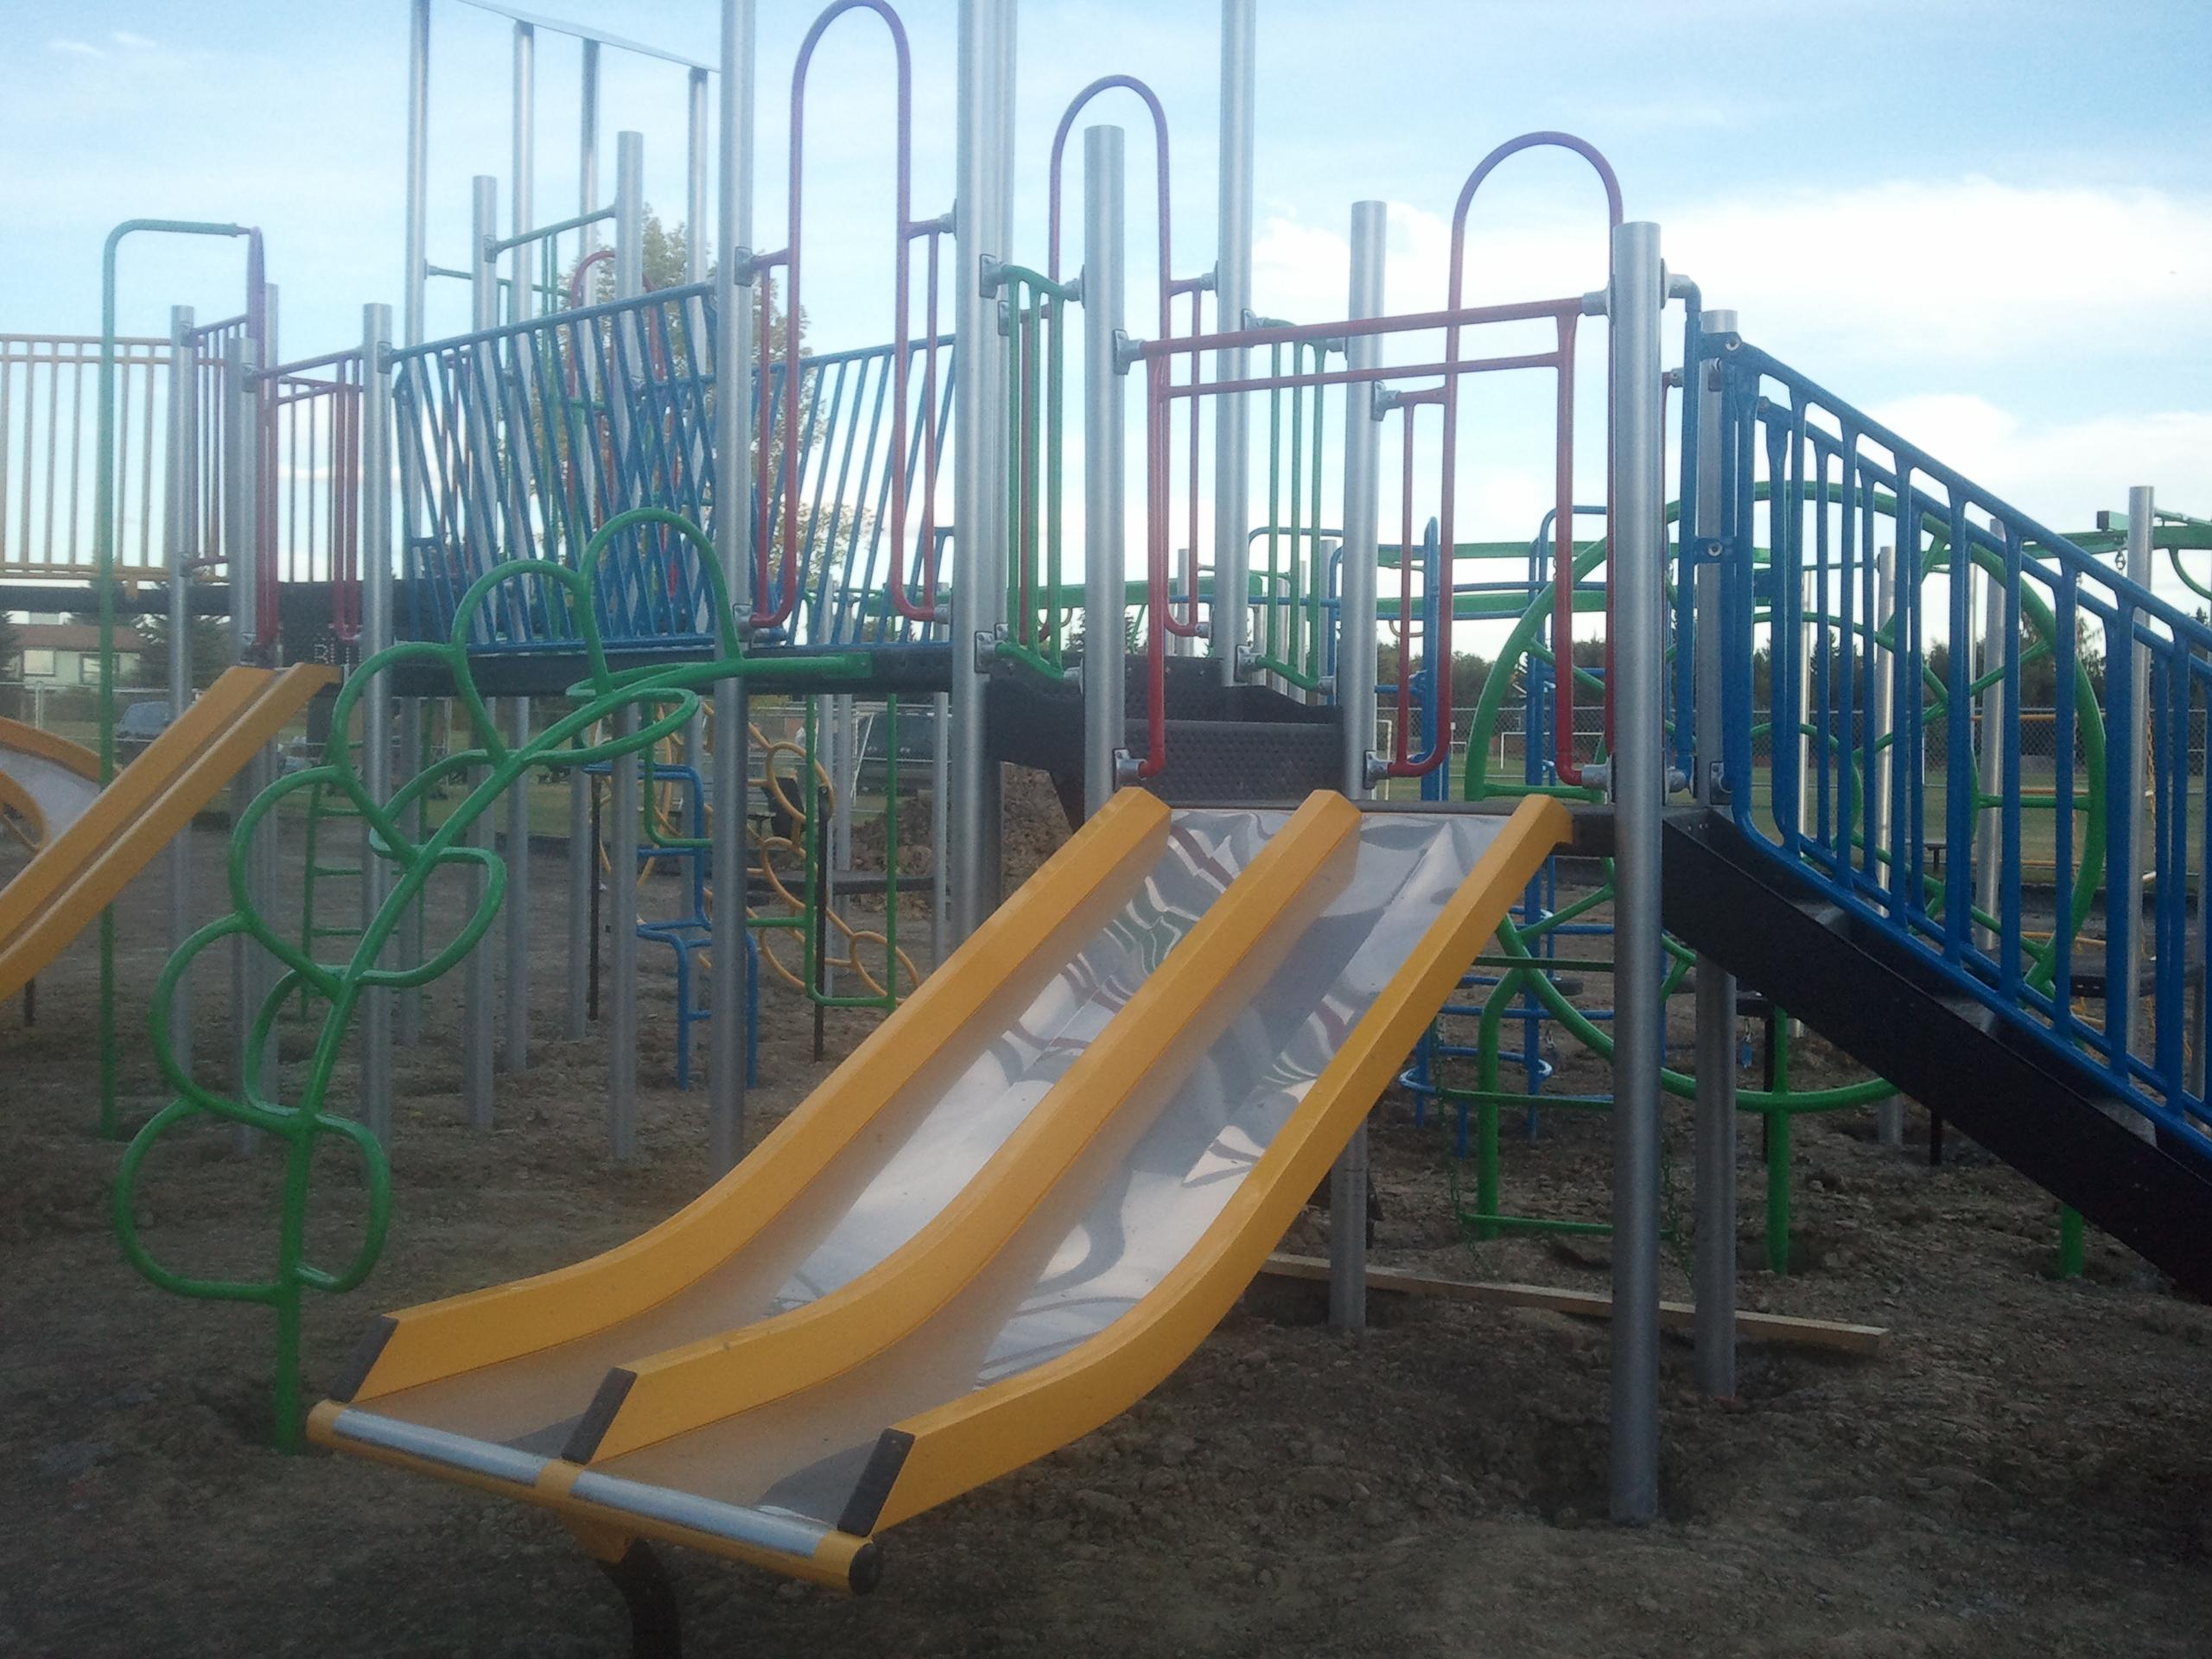 deer ridge yellow slide park playscape build  u2013 september 19